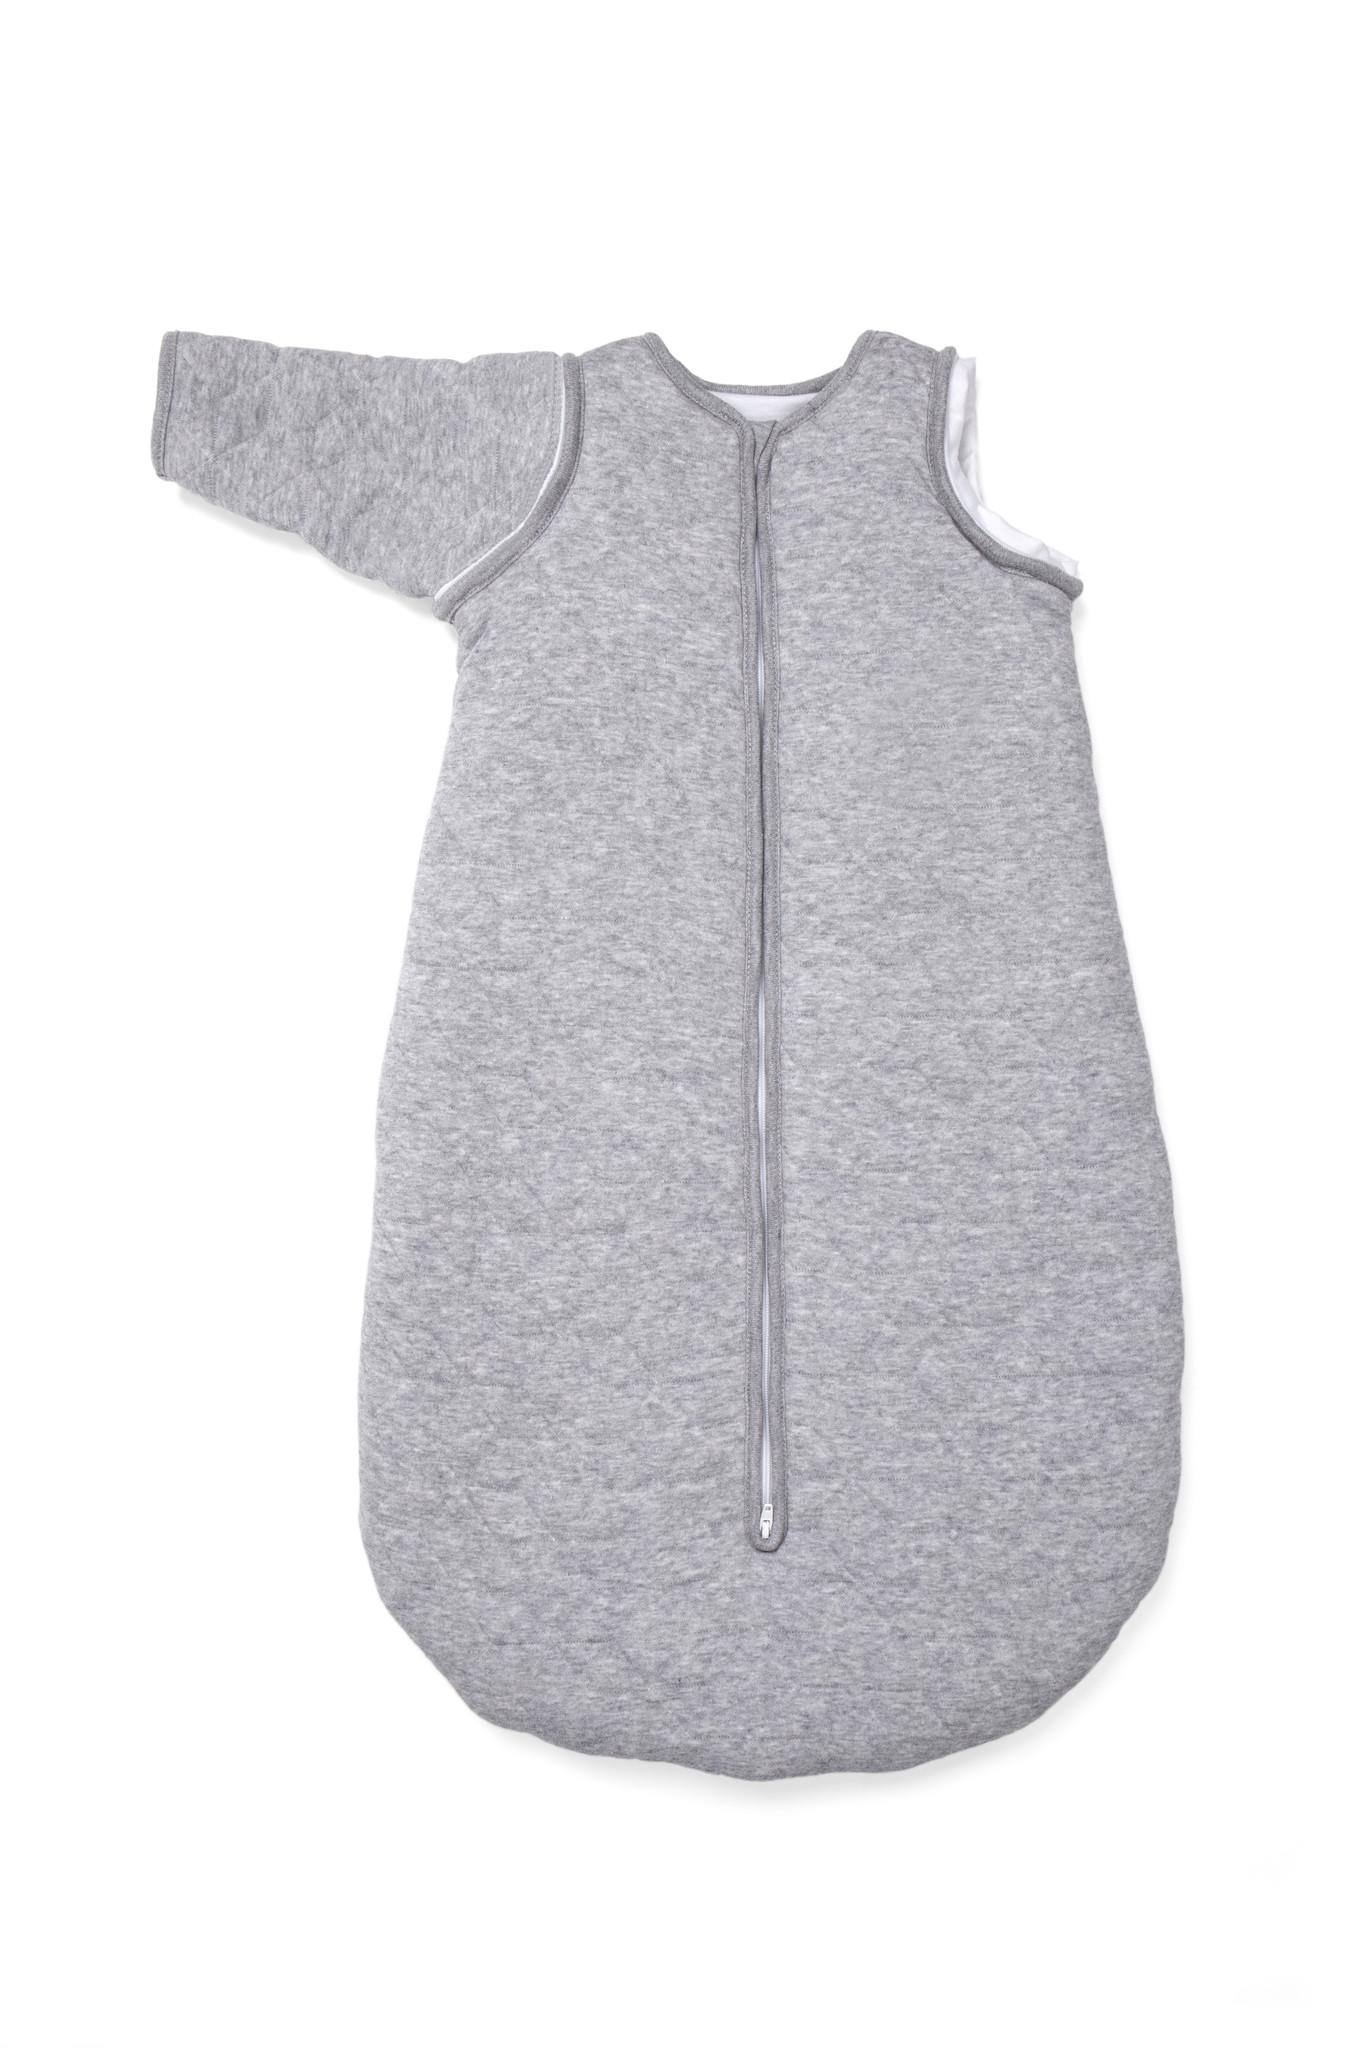 Jersey slaapzak 90cm met afritsbare mouwen Star Grey Melange-4